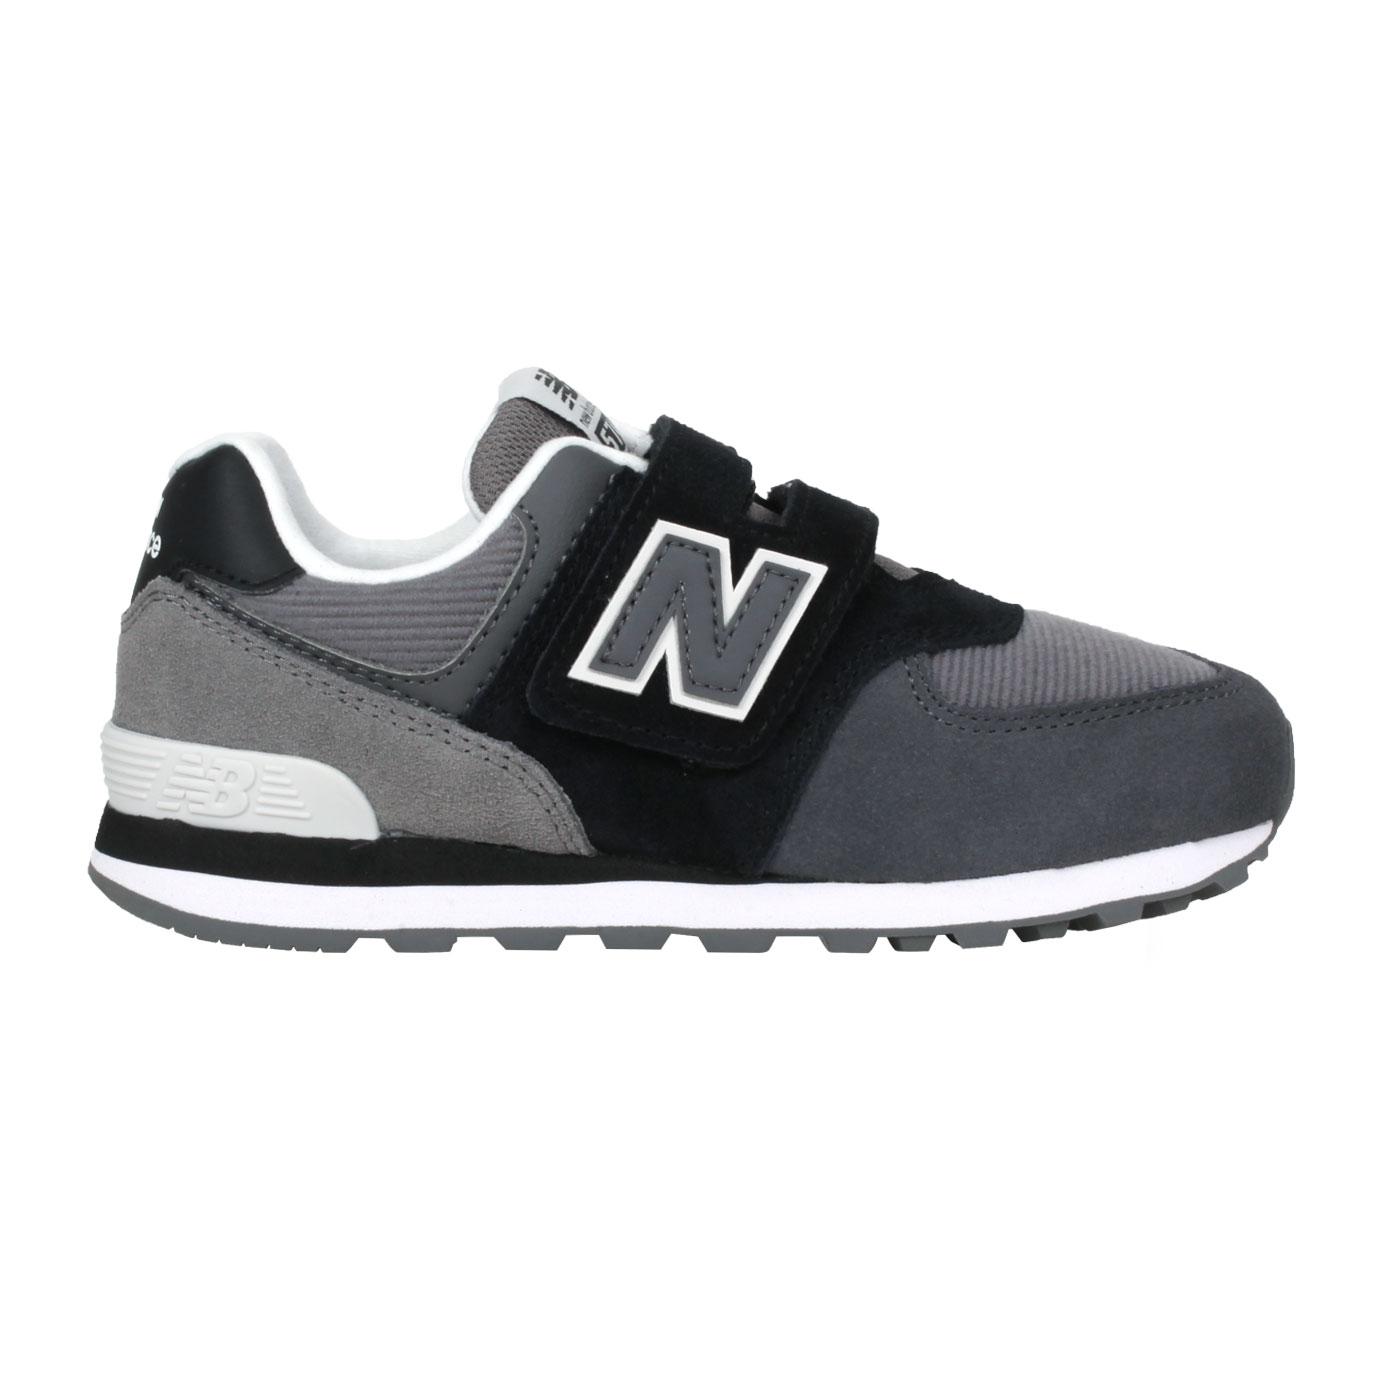 NEW BALANCE 中童休閒運動鞋-WIDE PV574WR1 - 黑灰白